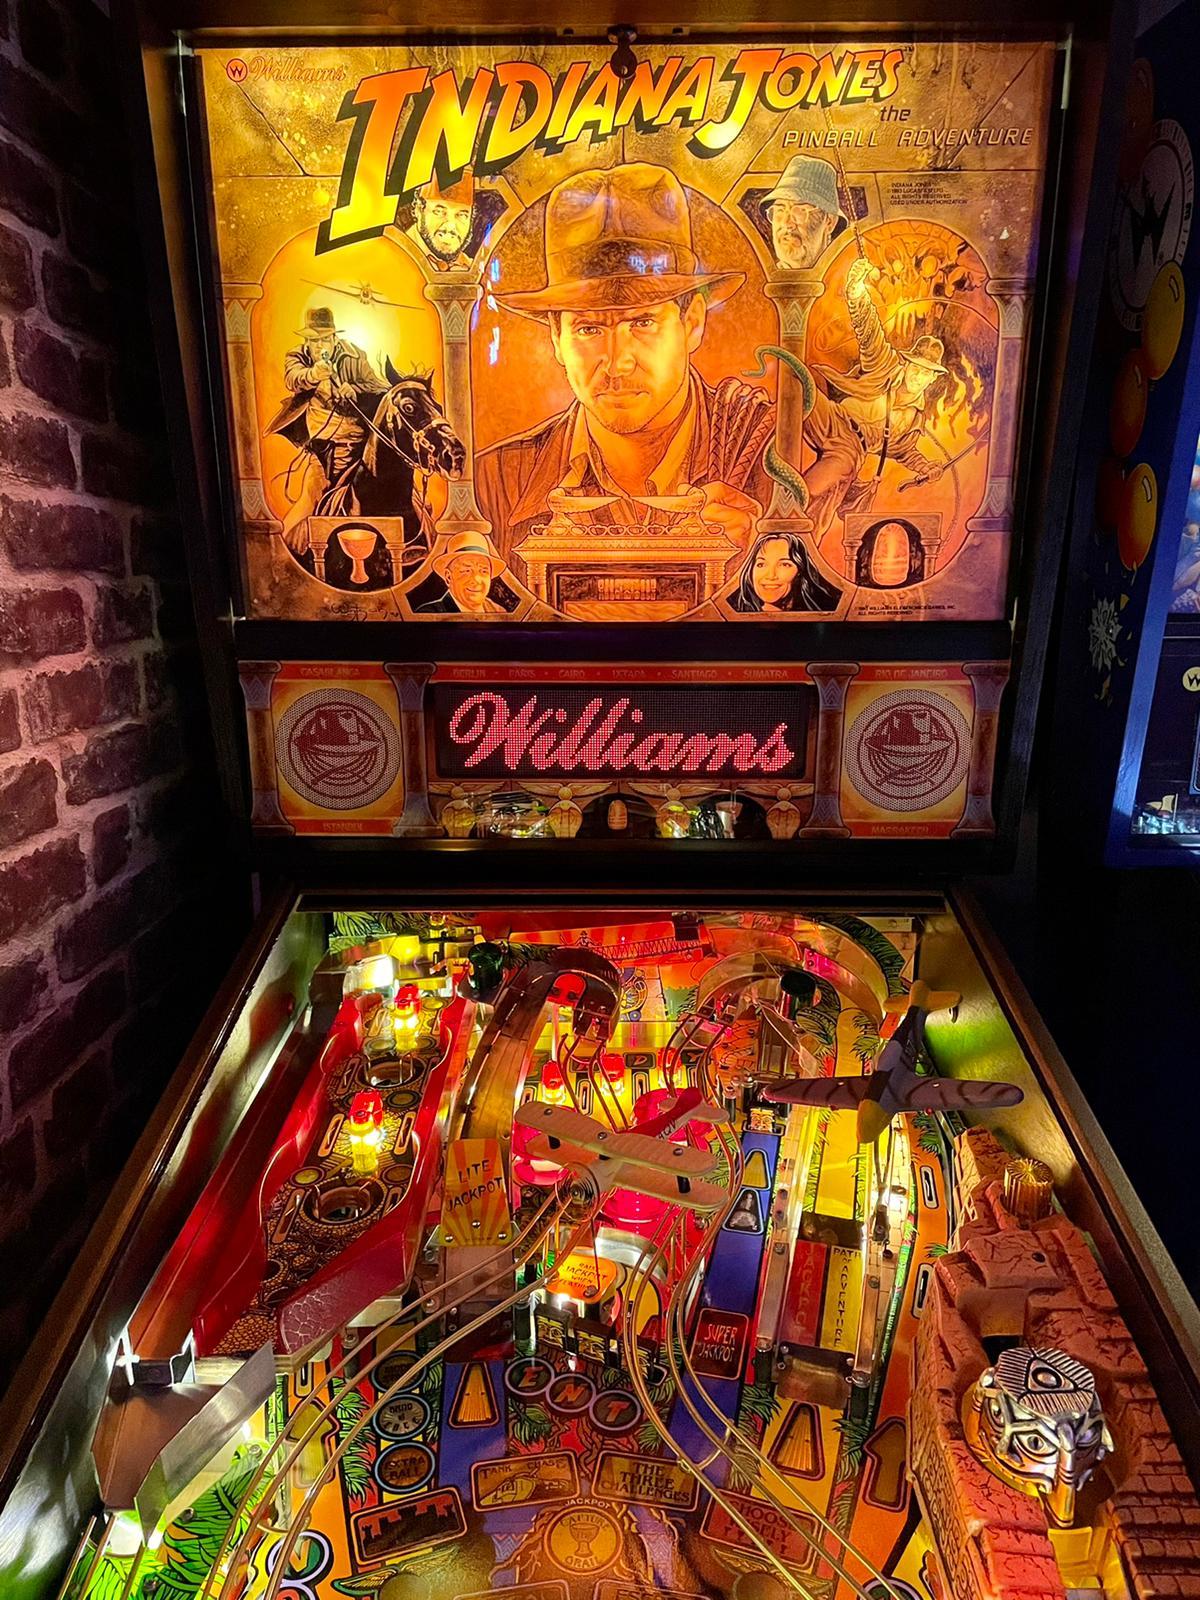 Haut du playfied Indiana Jones Williams et backglass